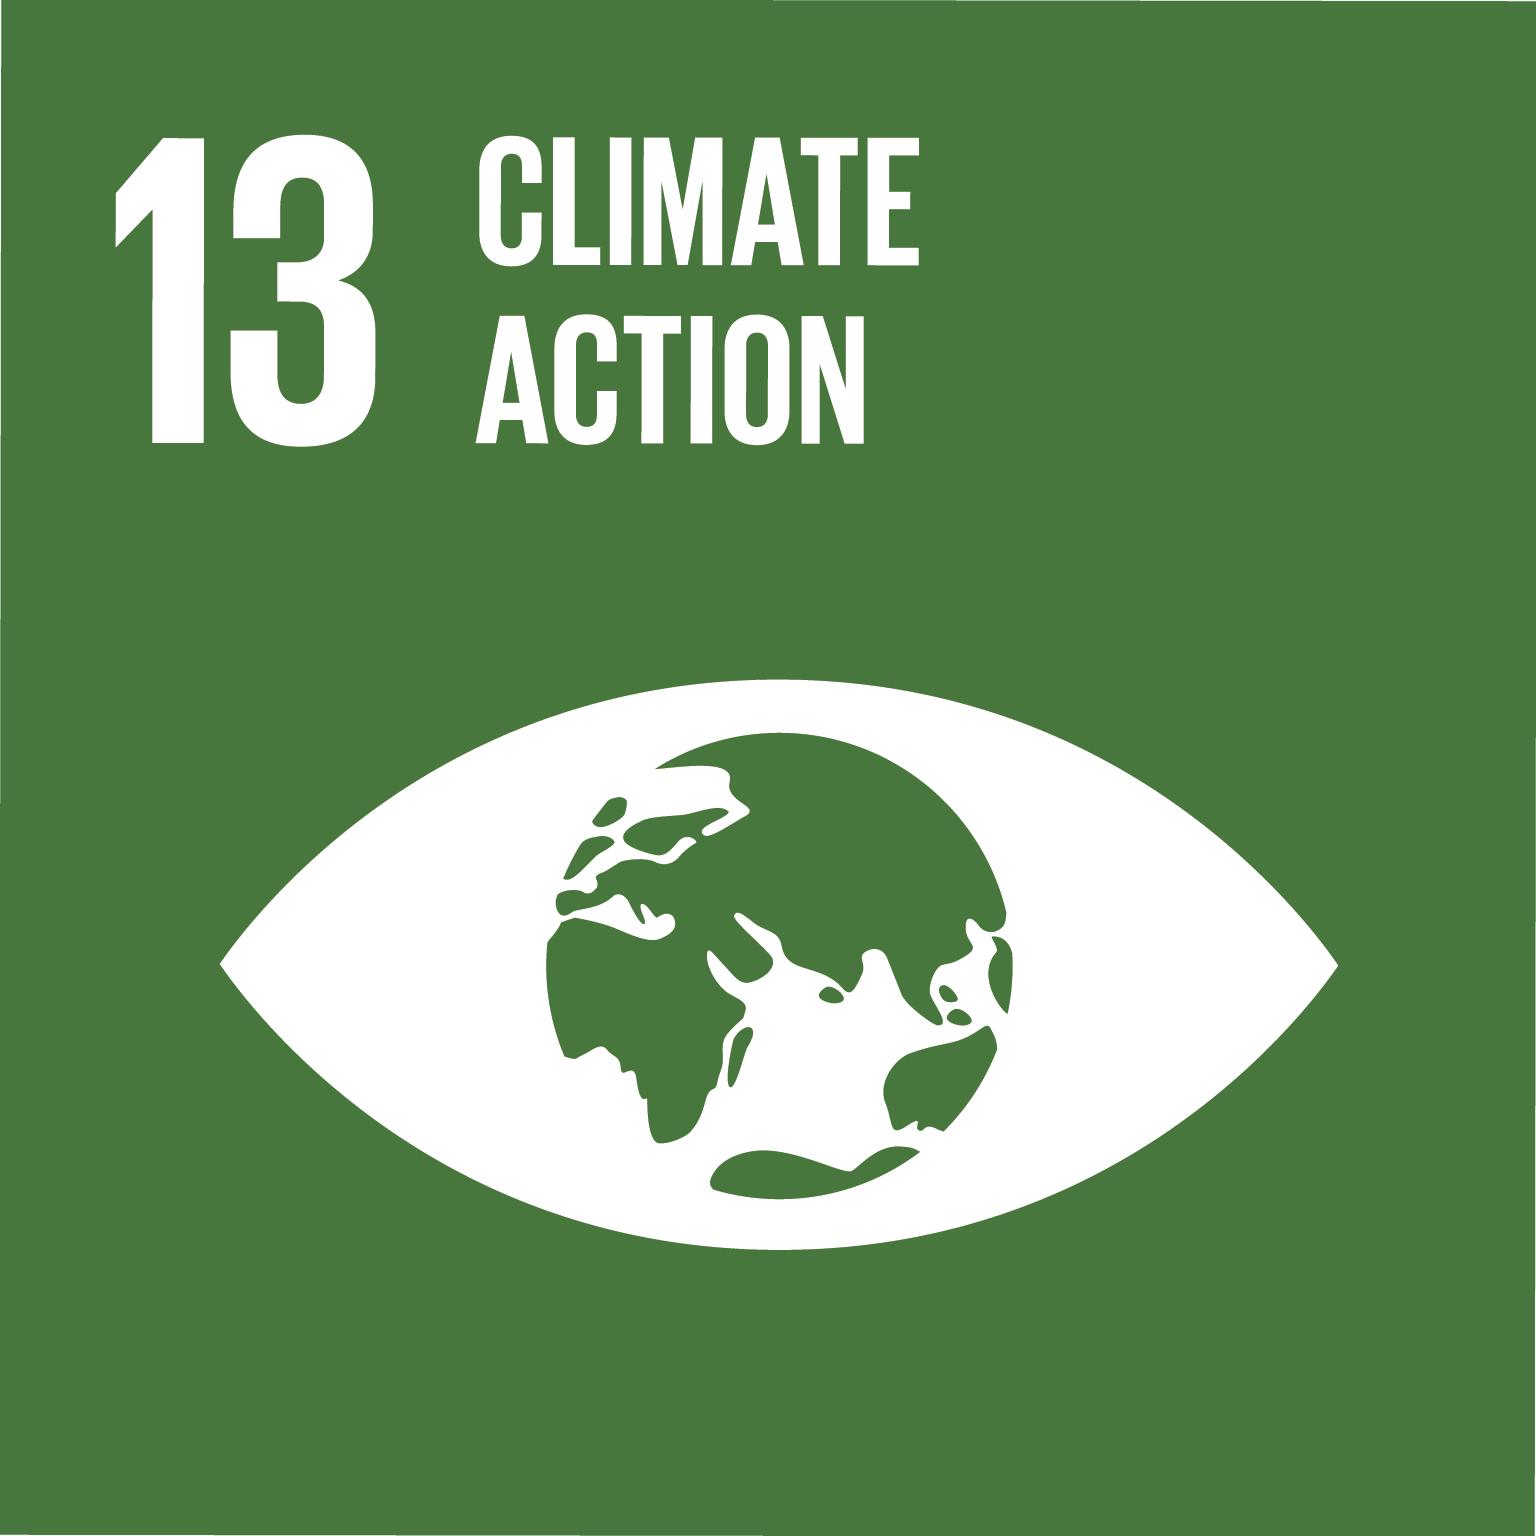 E_SDG goals_icons-individual-rgb-13.png